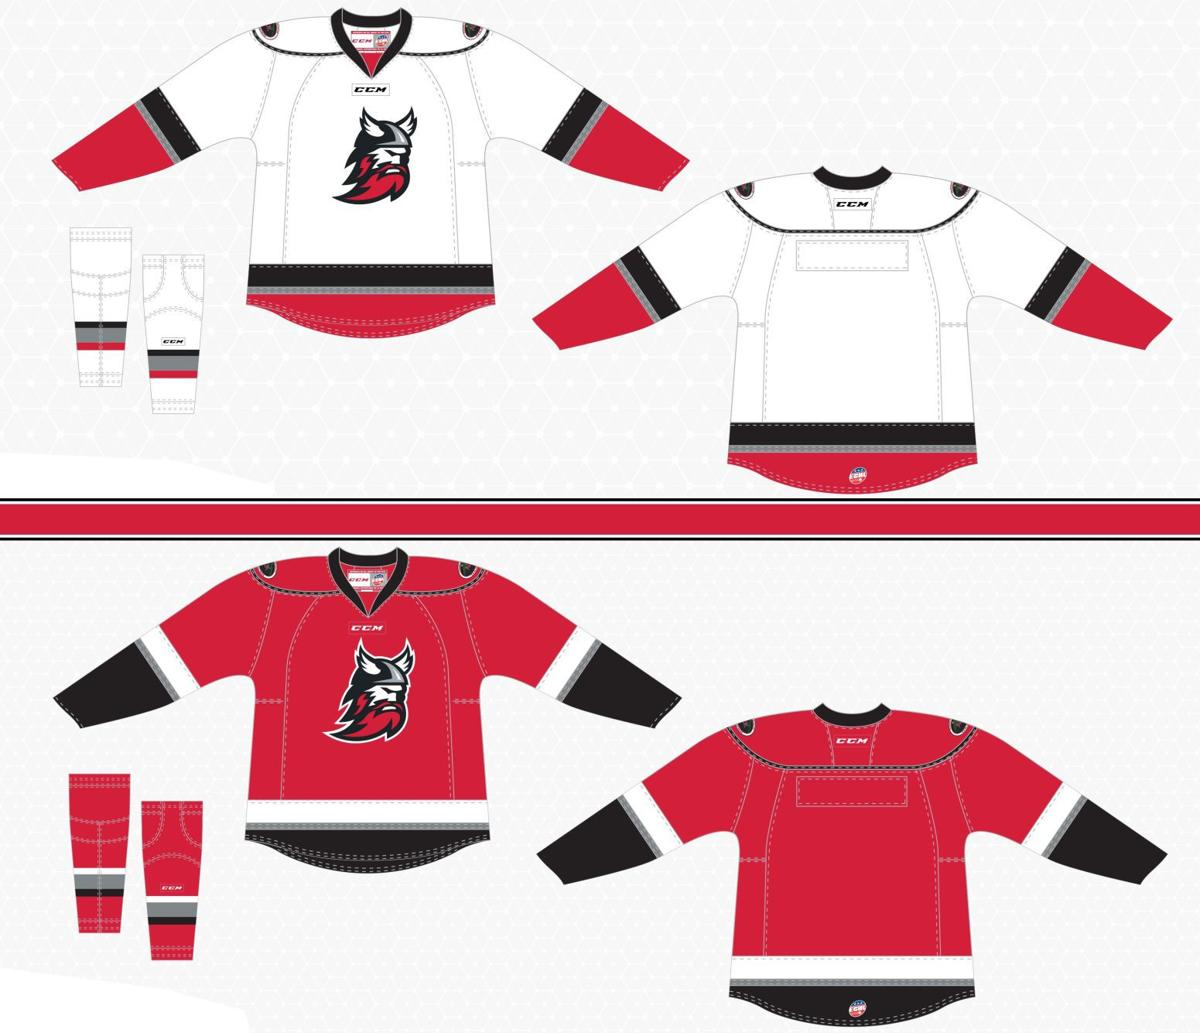 Thunder 1819 jerseys